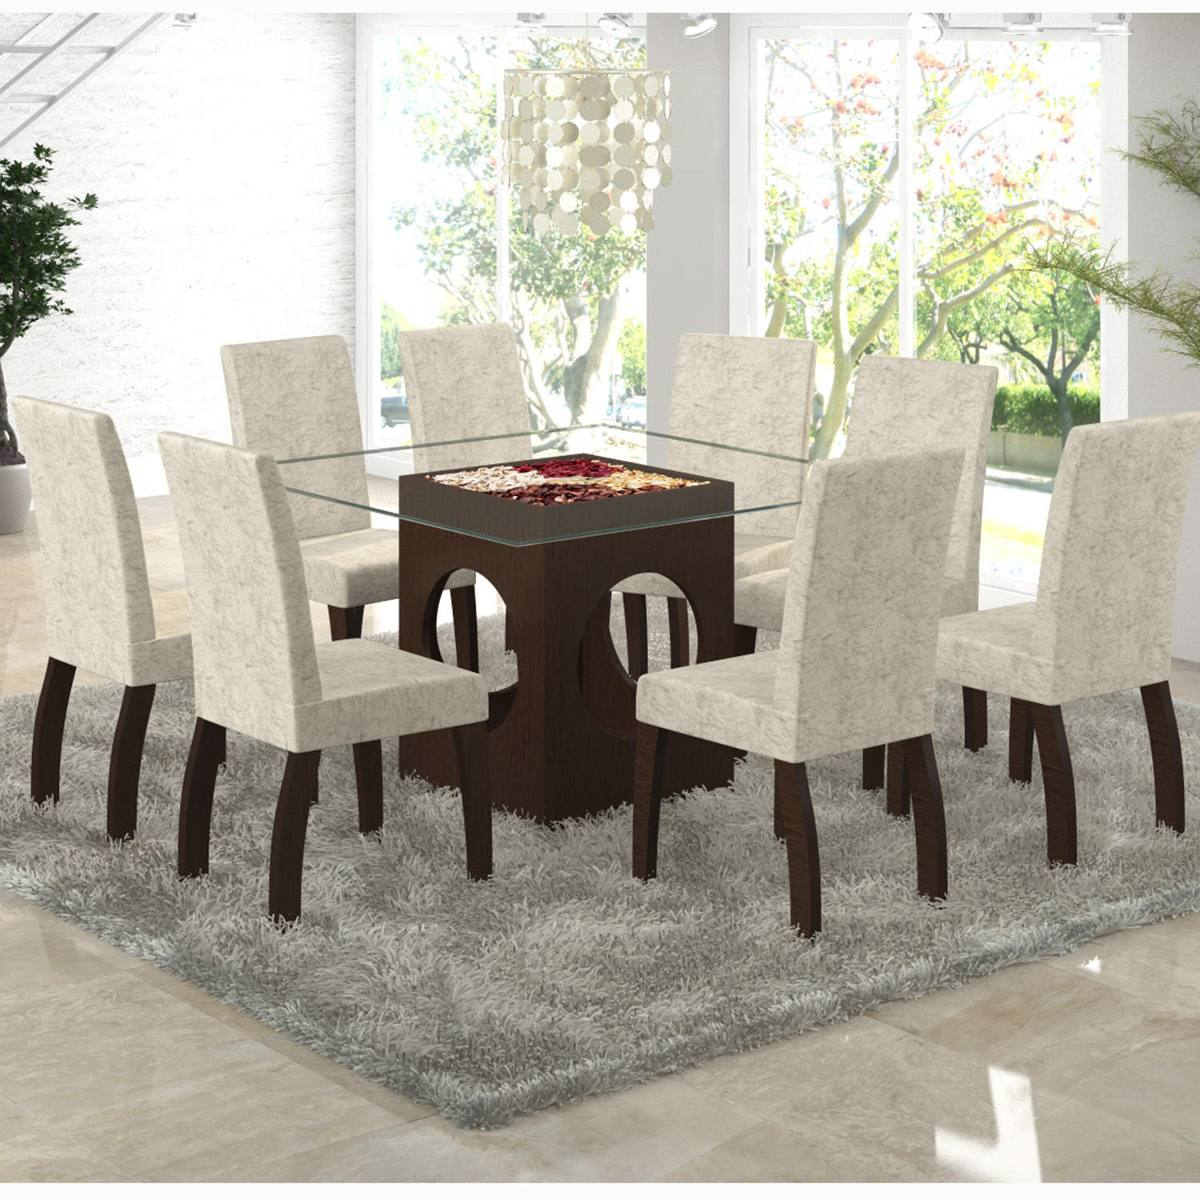 Sala de jantar 8 cadeiras viero f nix choco soft r 1 for Sala 2 conjunto de artes escenicas